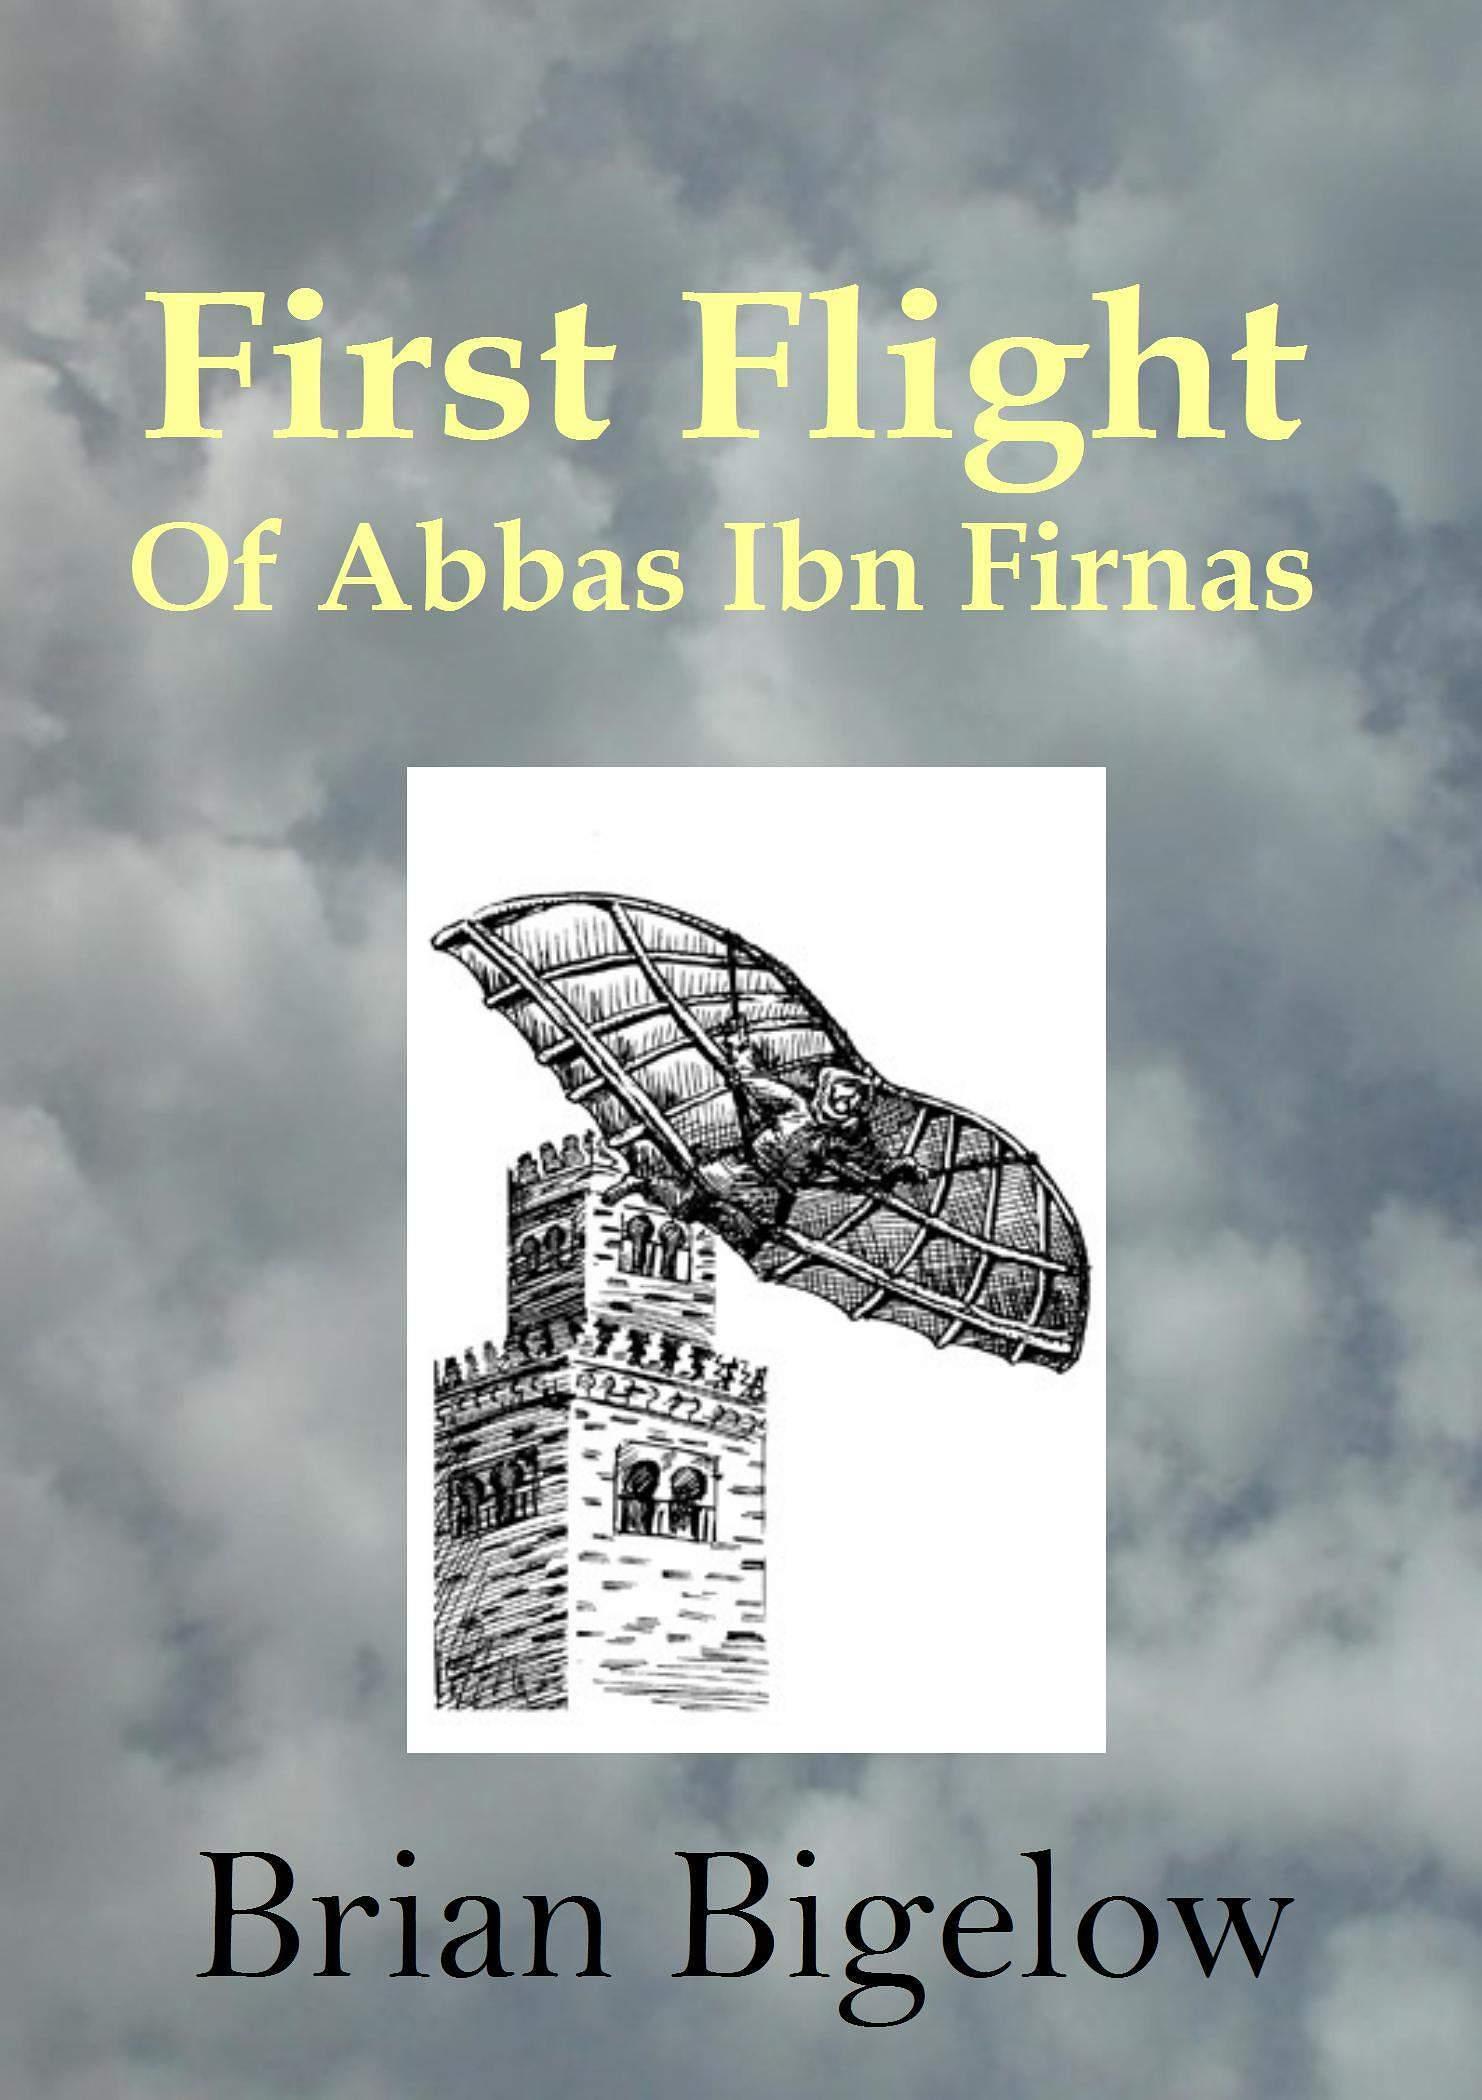 First Flight Of Abbas Ibn Firnas By Brian Bigelow